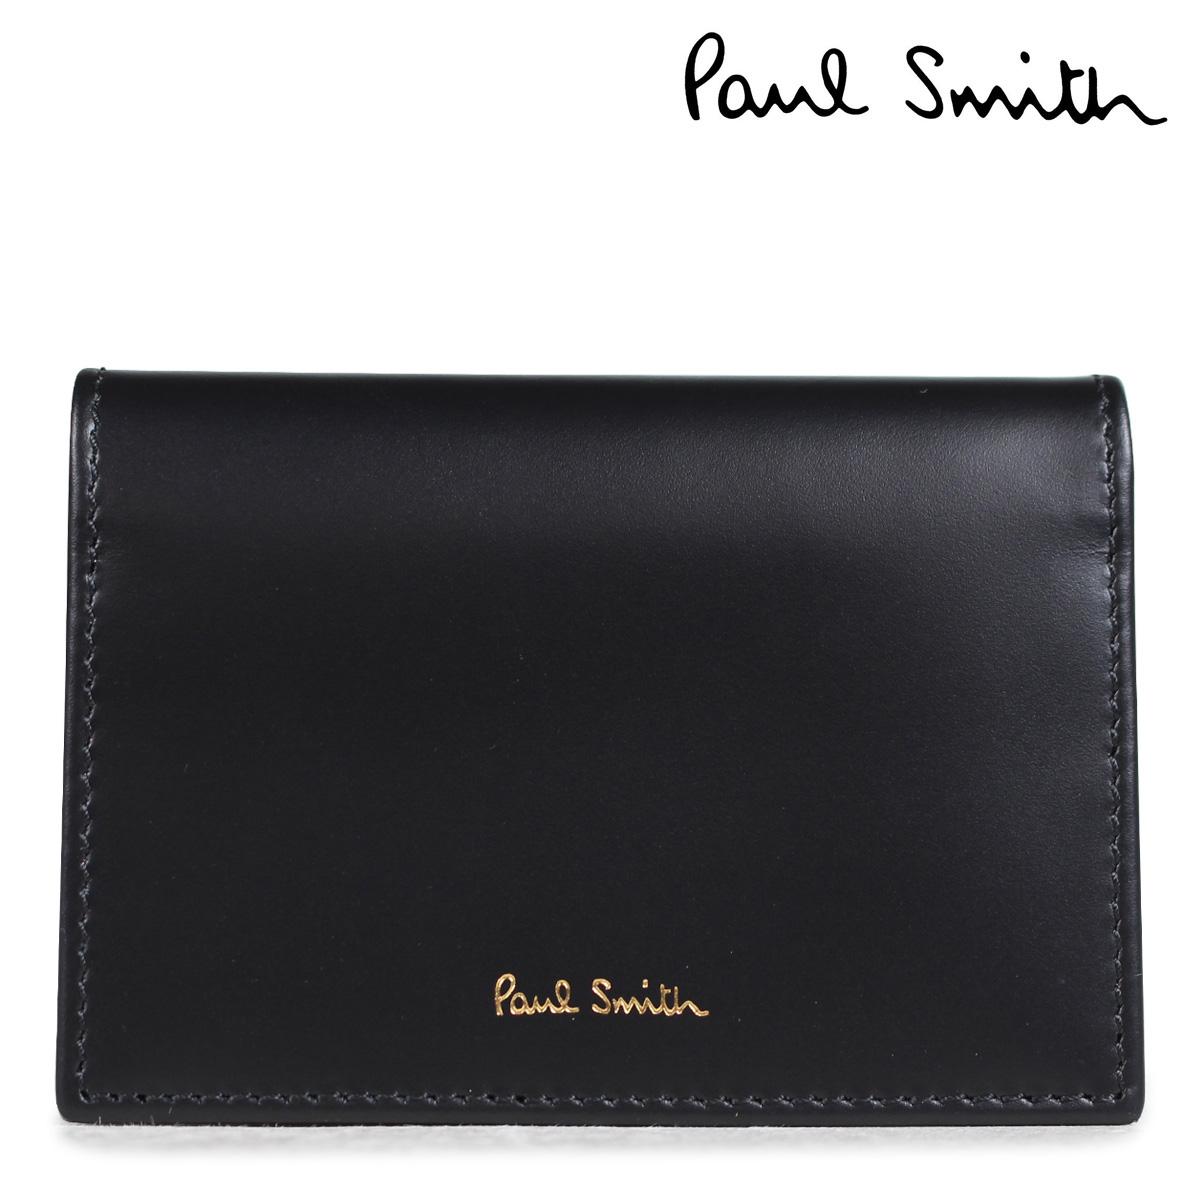 Paul Smith 名刺入れ メンズ カードケース ポールスミス FOLD OVER CREDIT CARD CASE 4776 W761A 79 ブラック